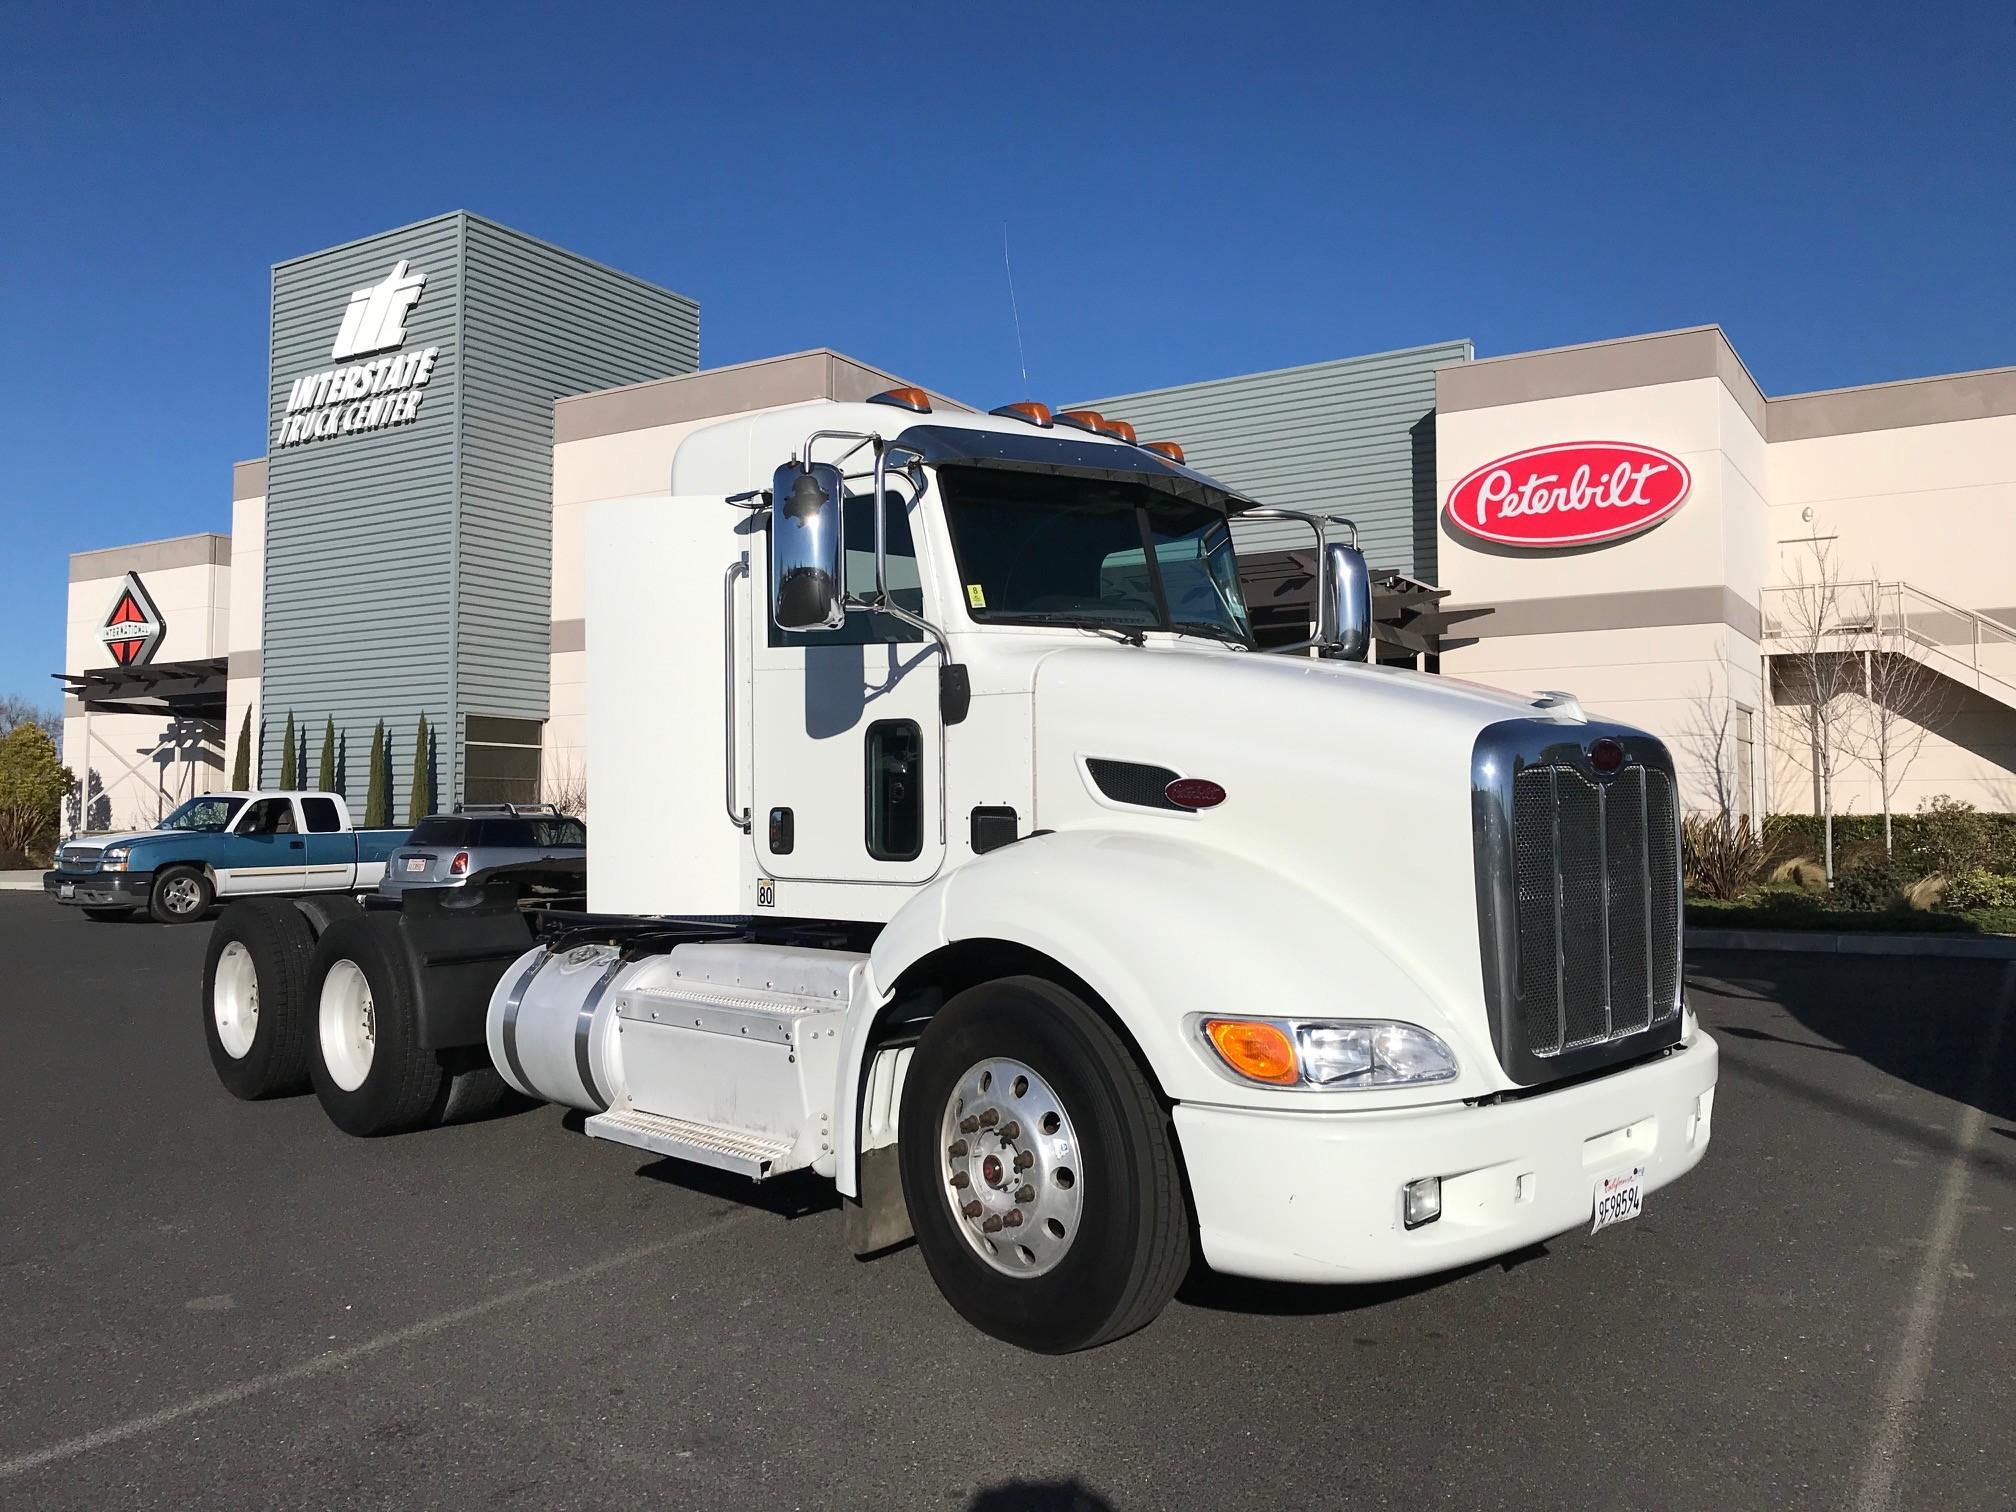 Used, 2014, Peterbilt, 384, Conventional Trucks